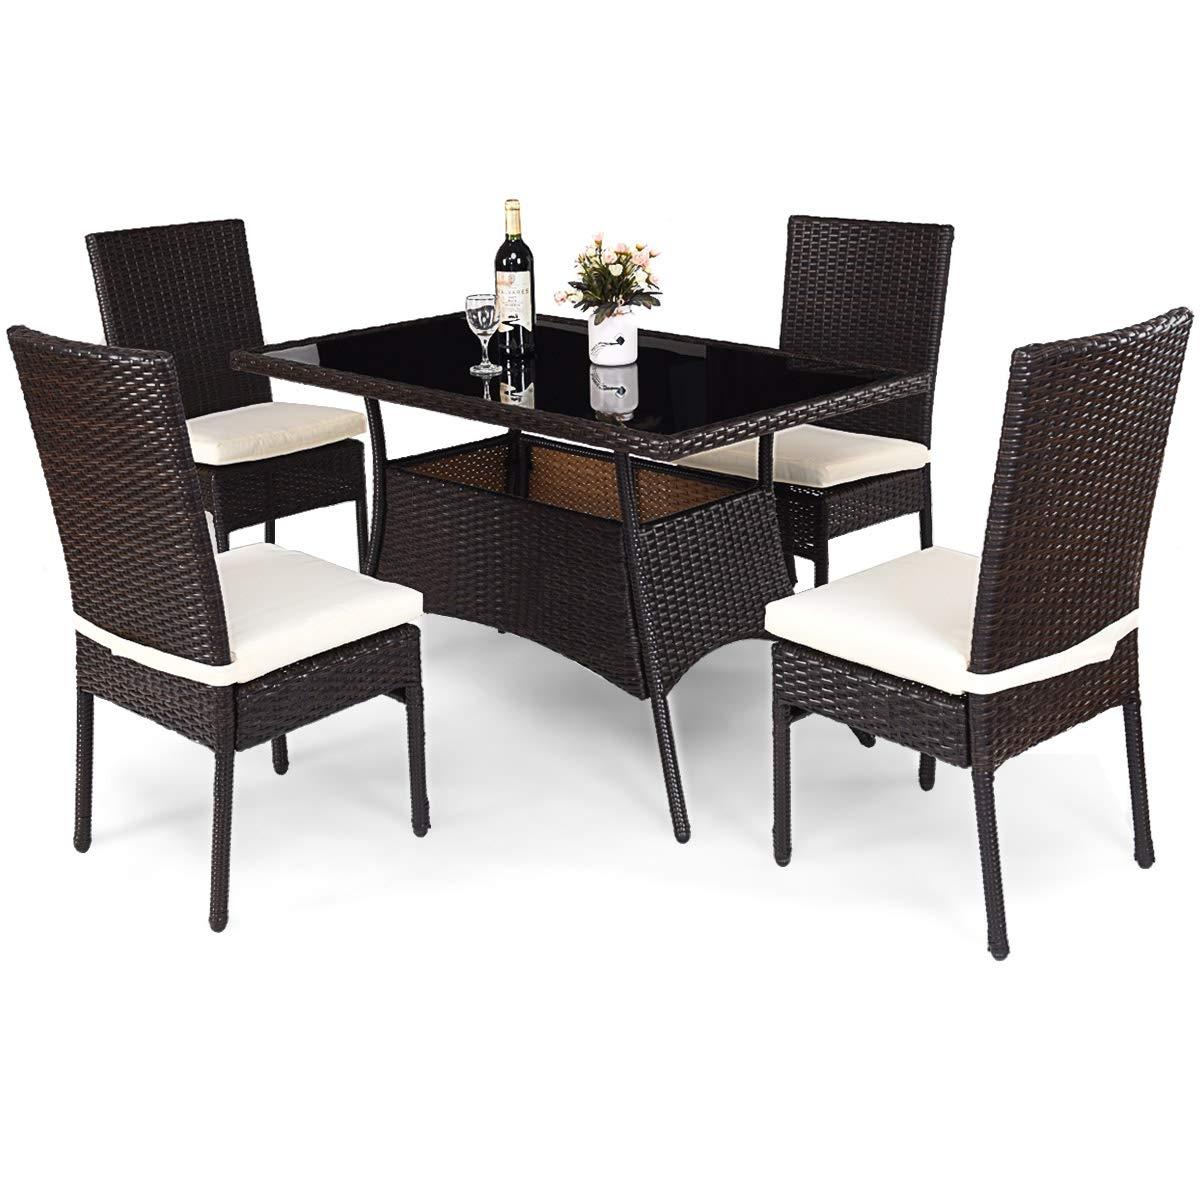 5 Piece Outdoor Patio Rattan Dining Furniture  Set